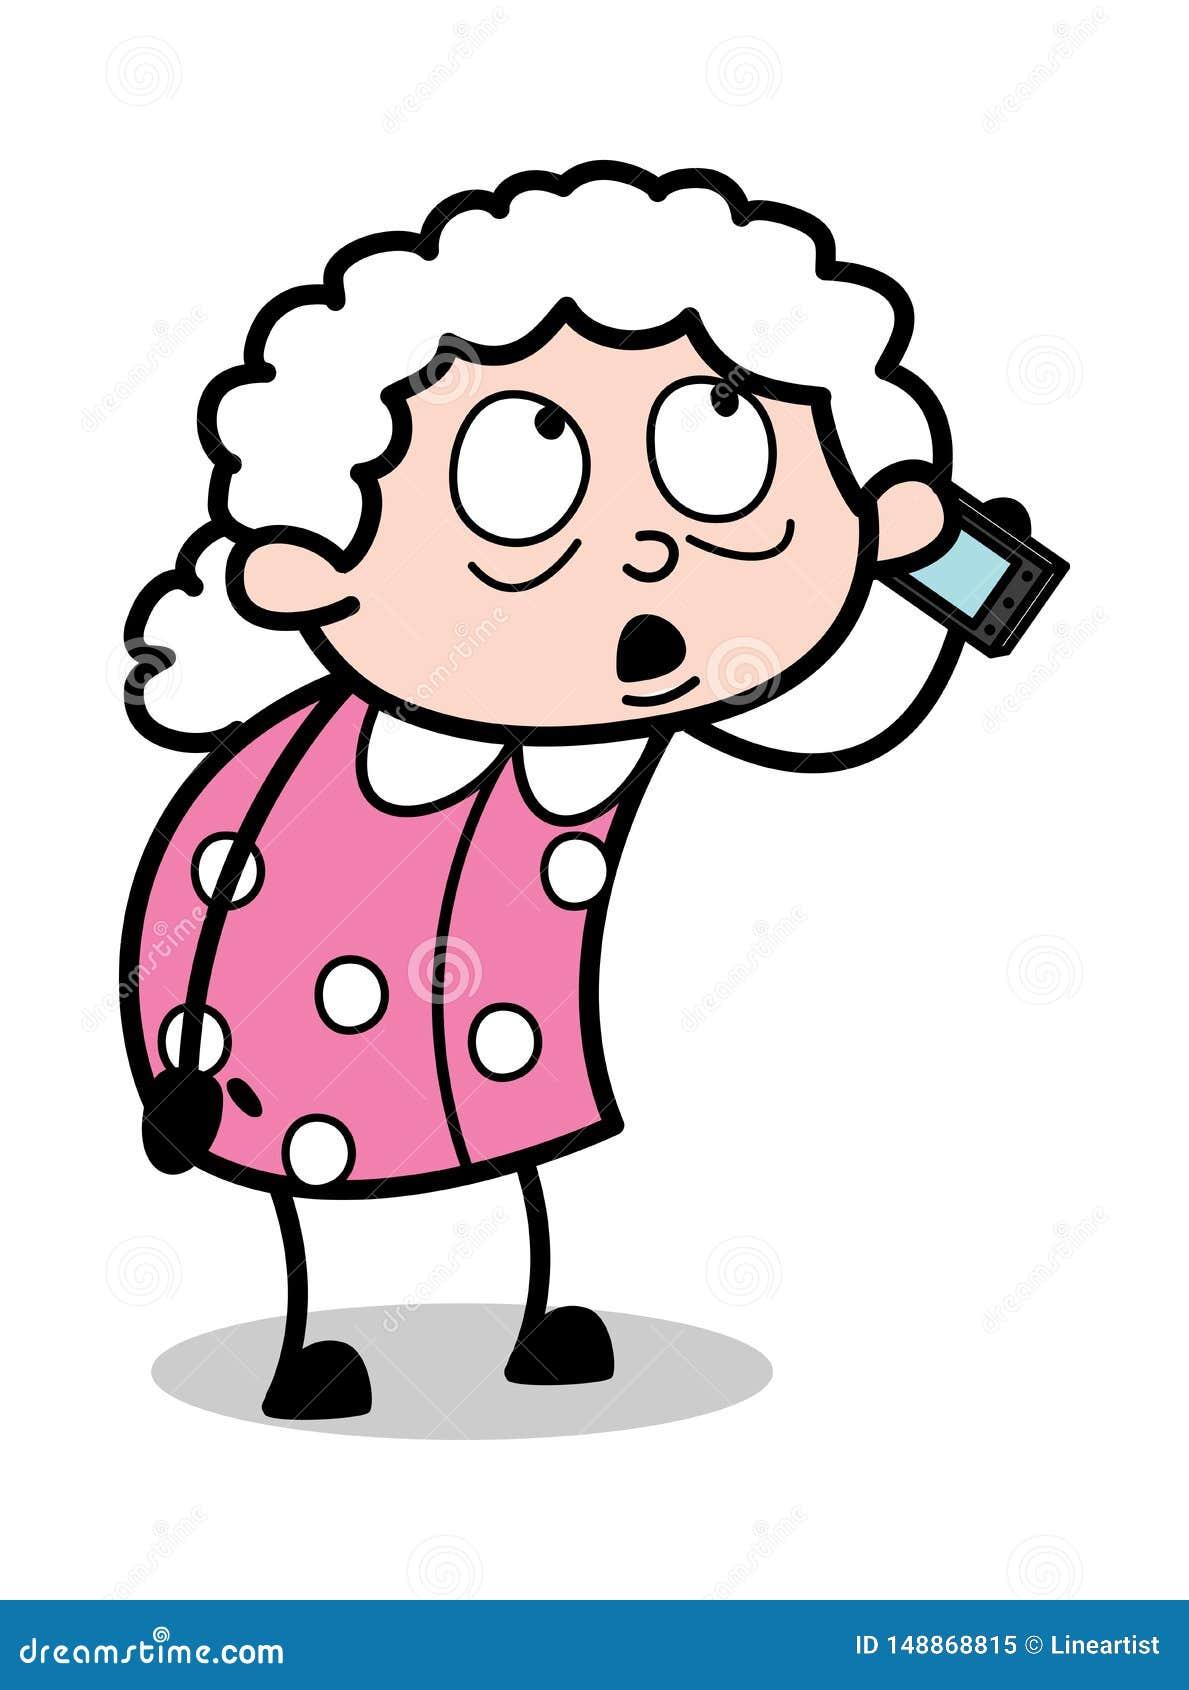 Phone talking cartoon on File:Woman Talking